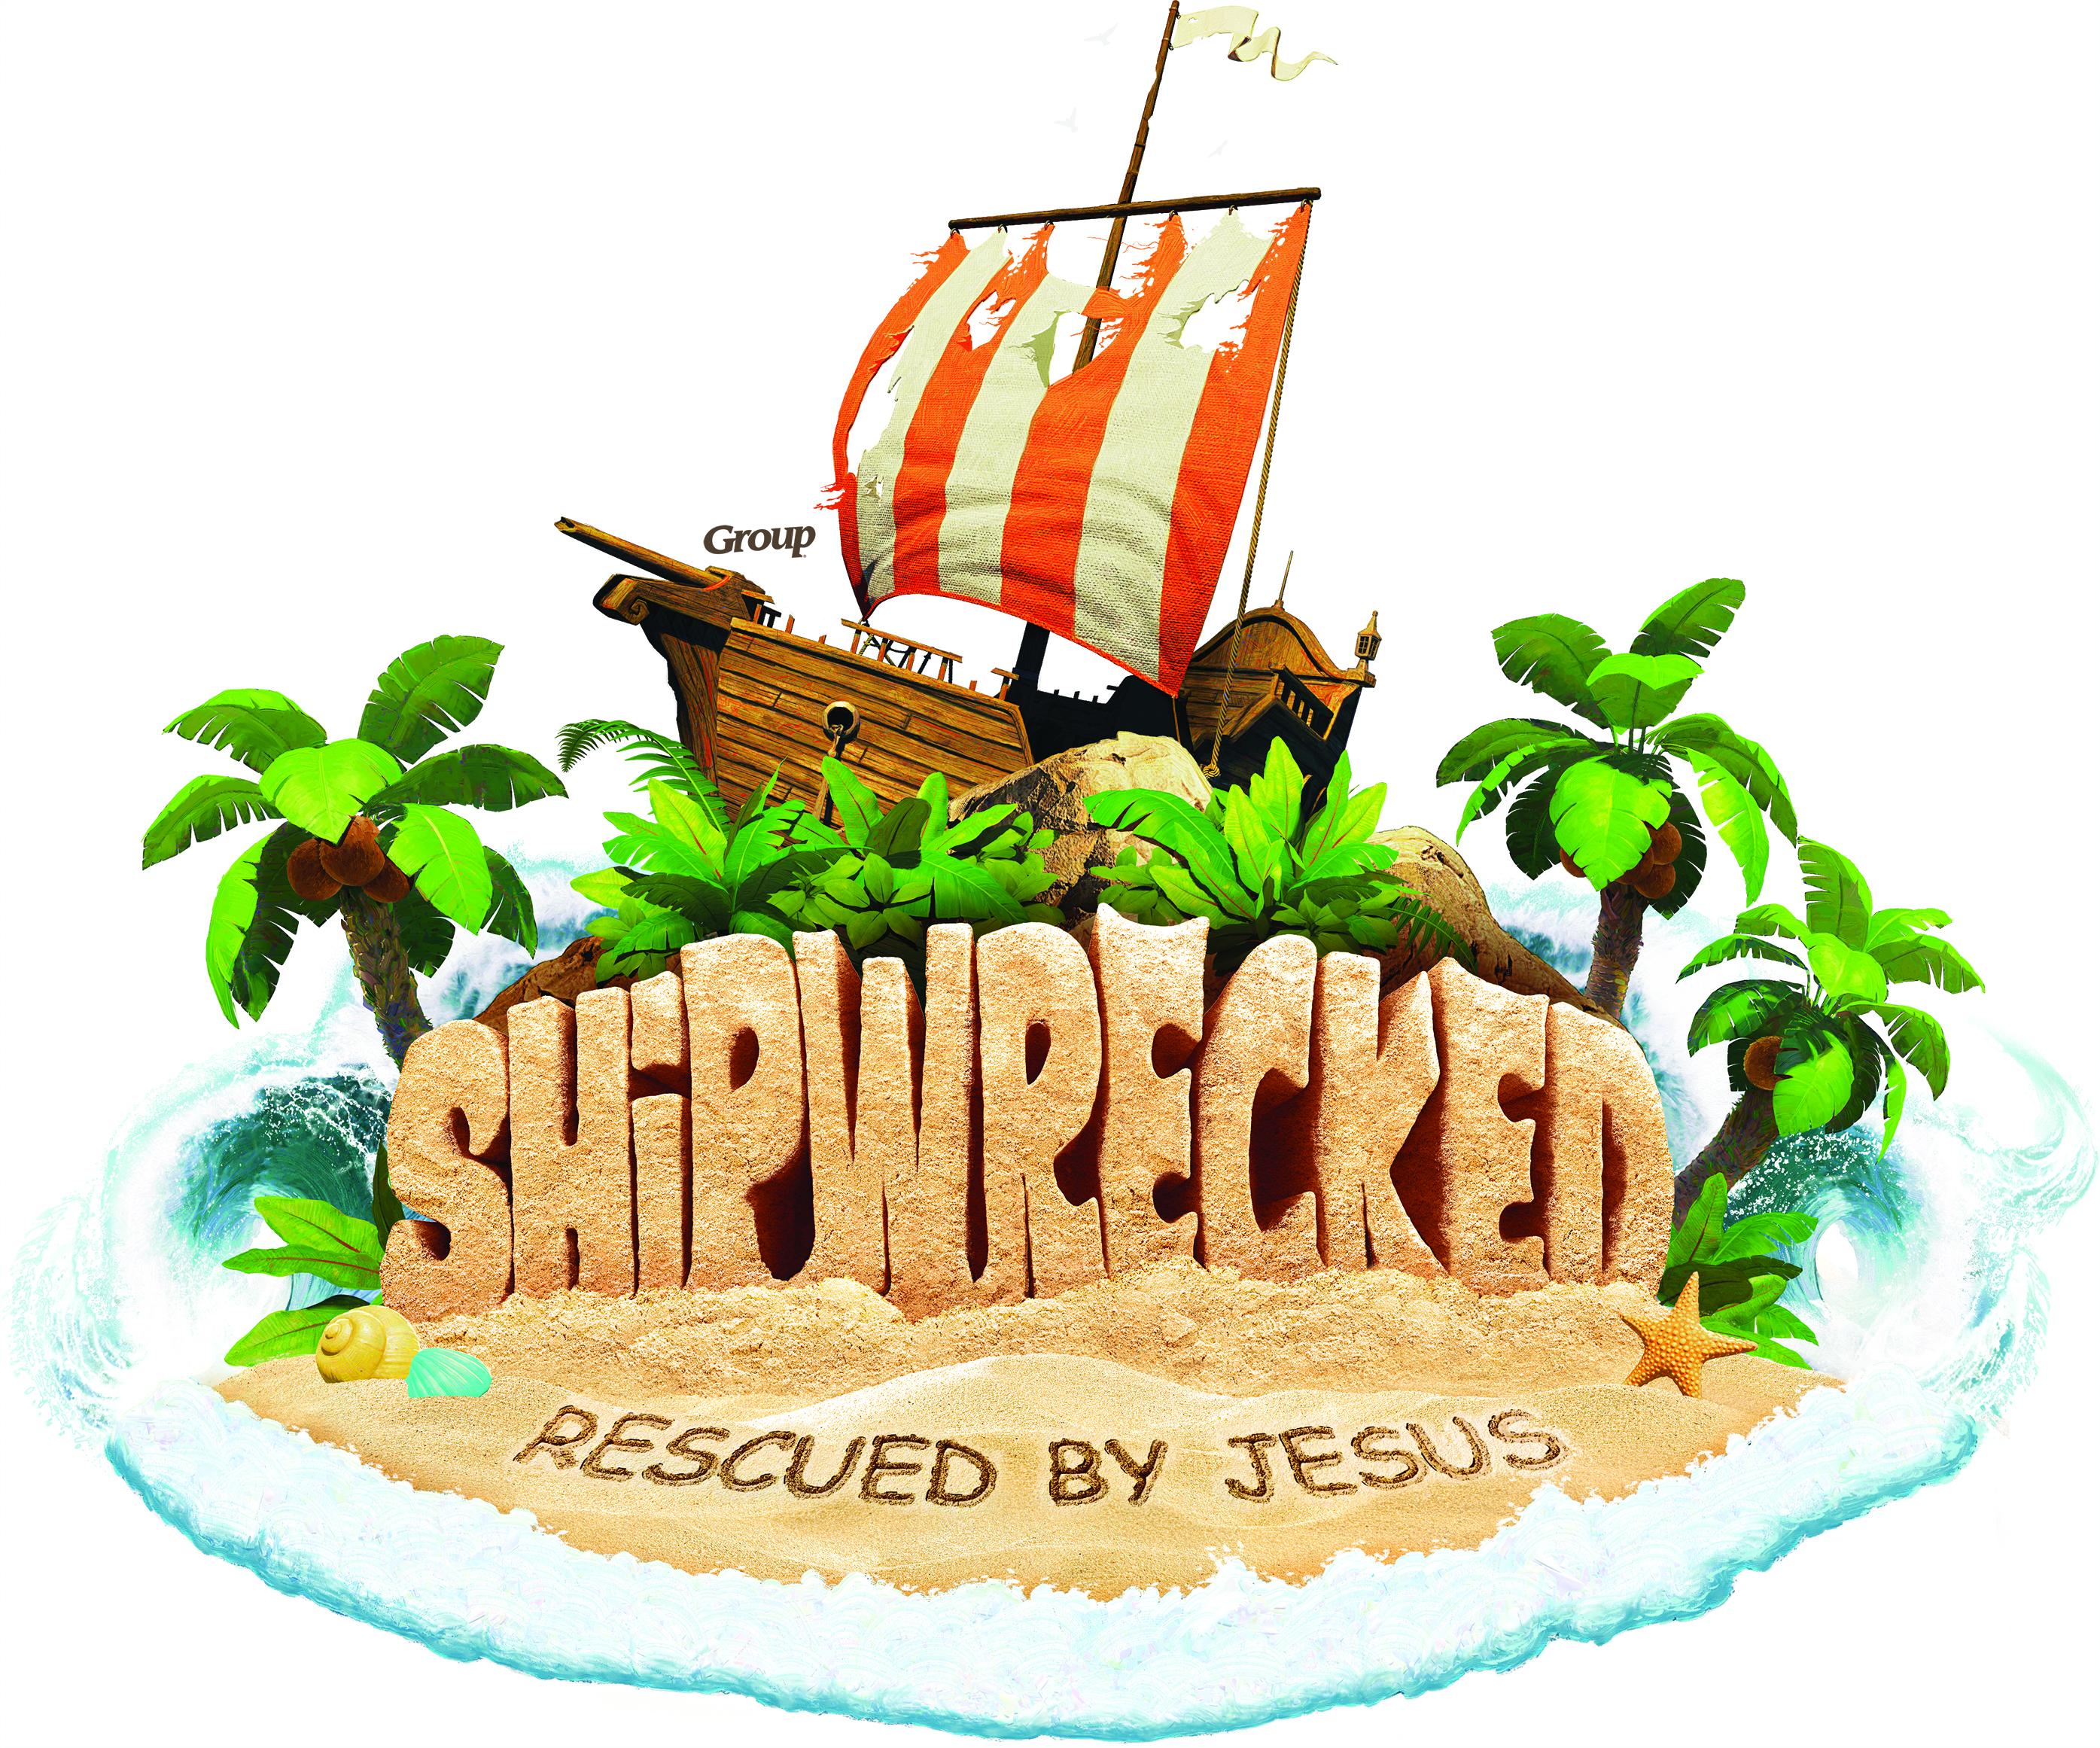 Shipwrecked vbs logo hires cmyk